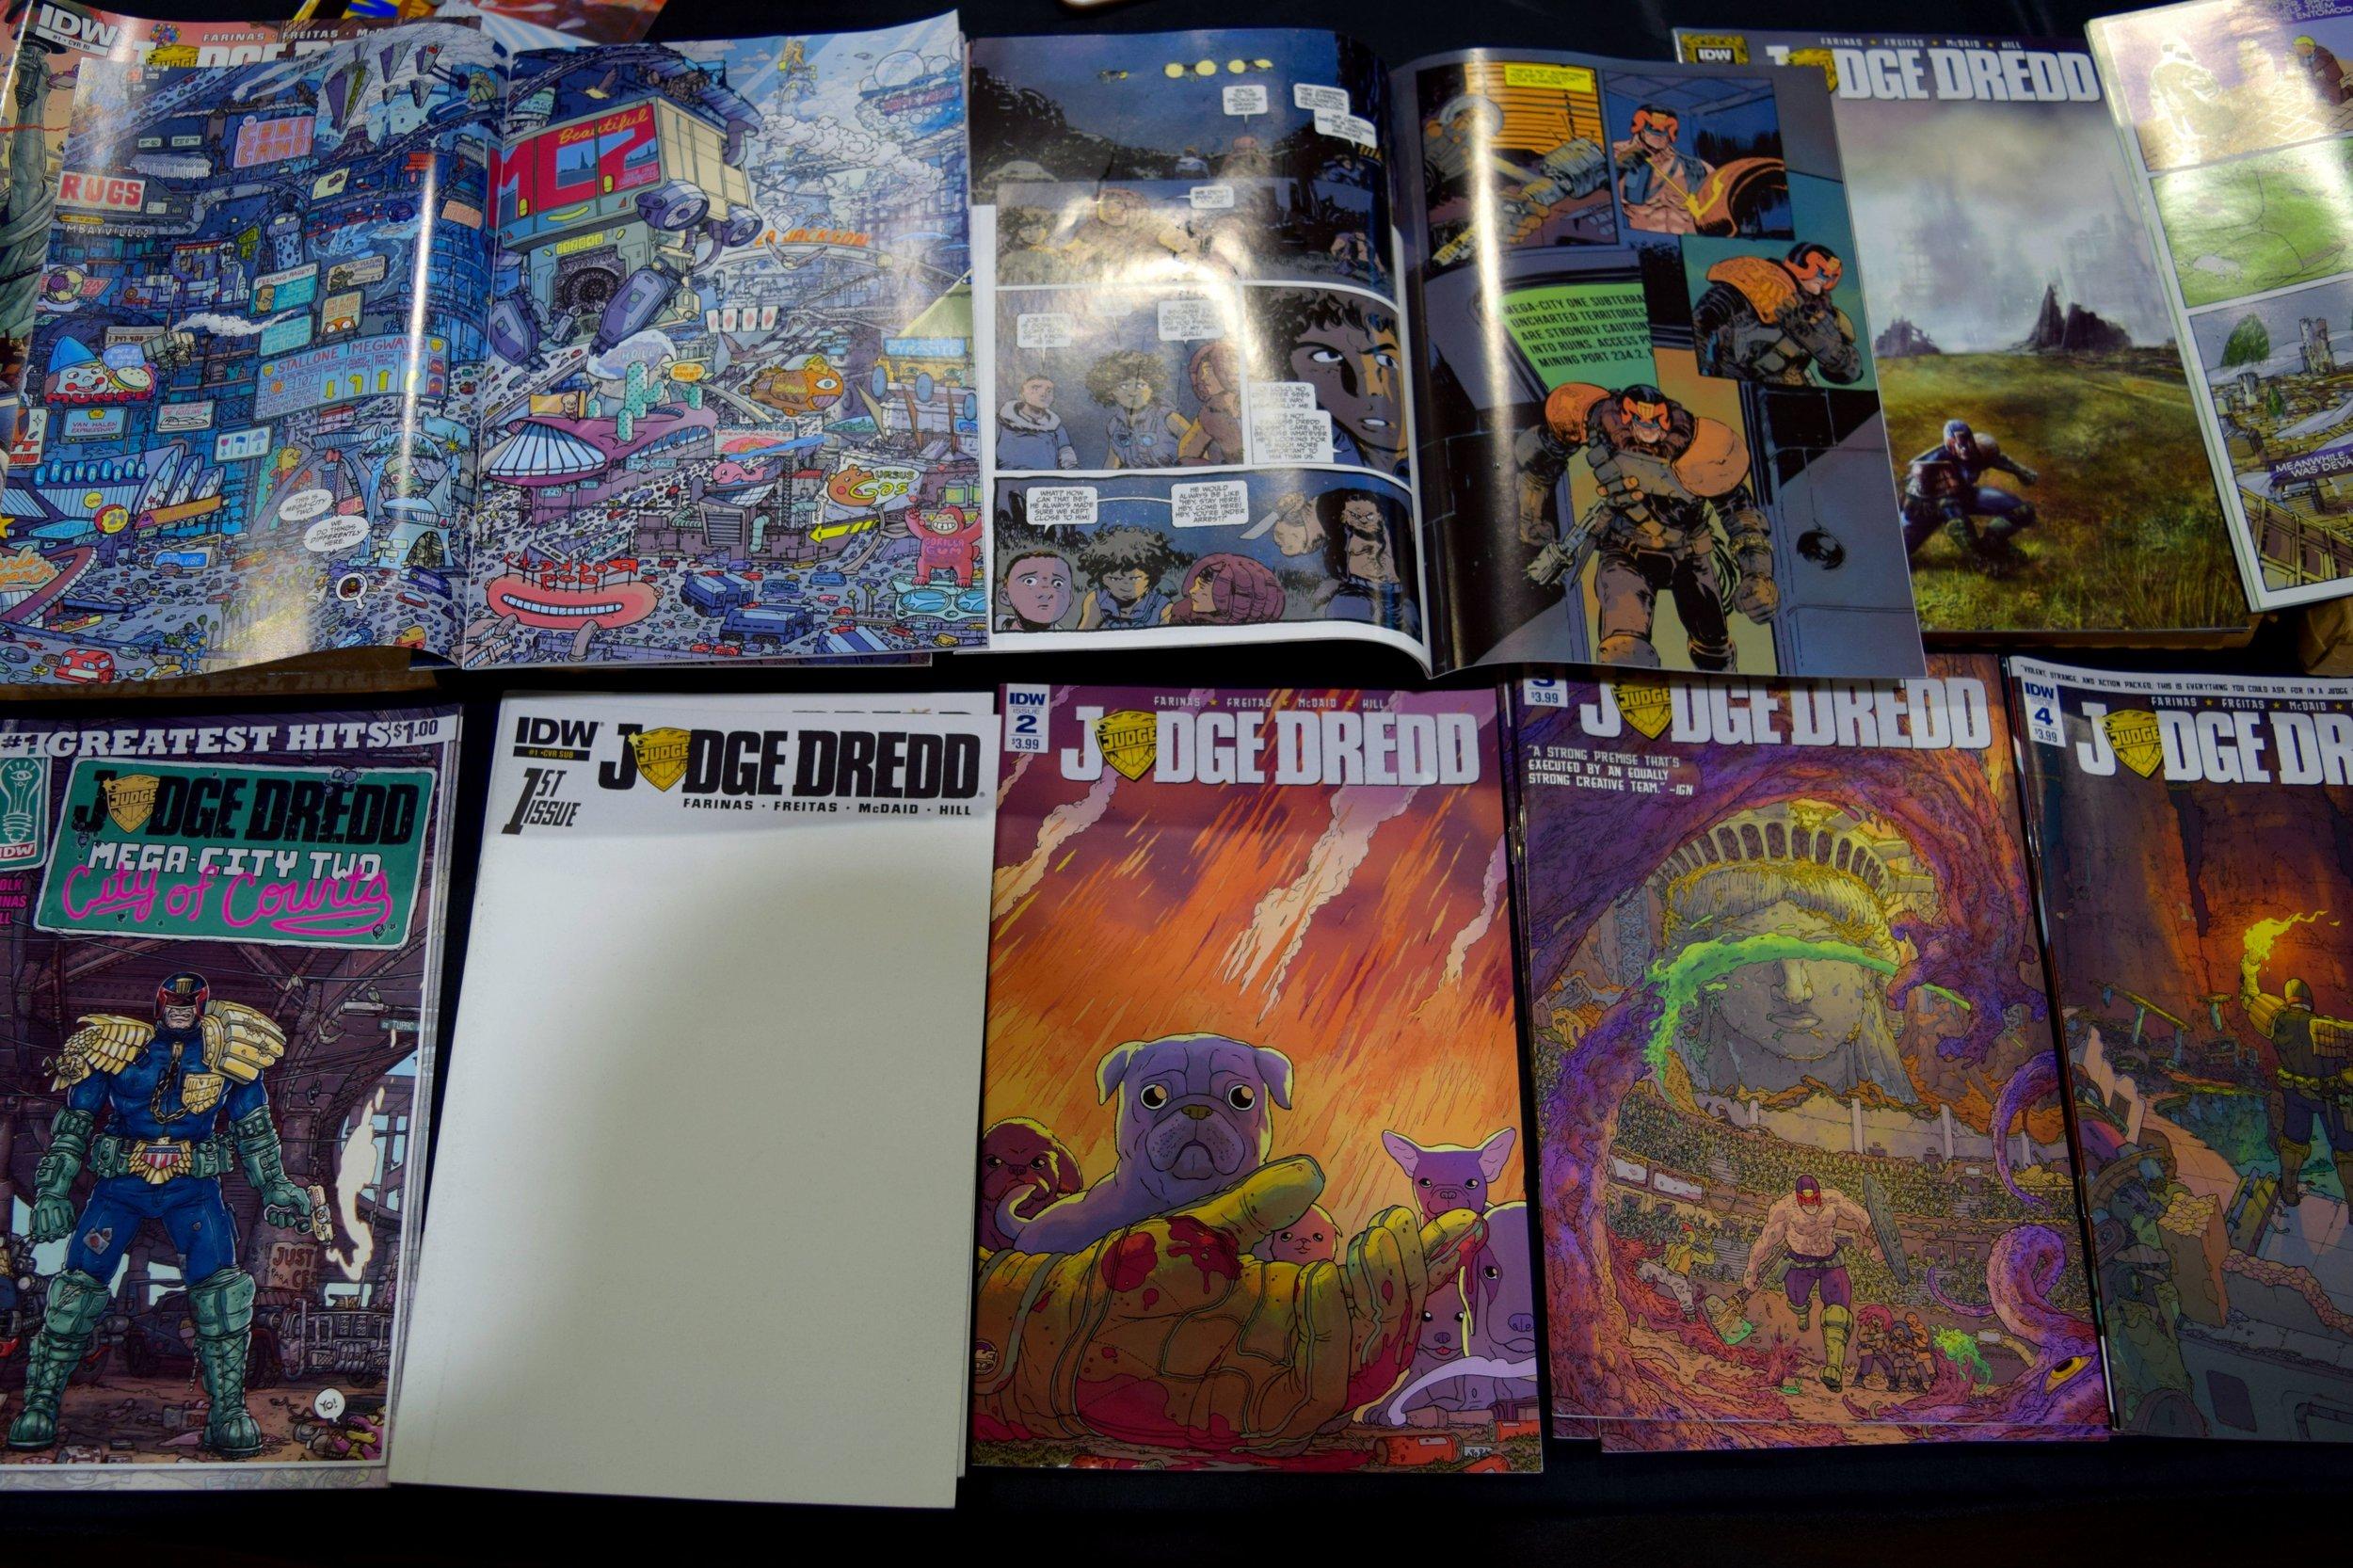 Judge Dredd comics from Ulises Farinas at Fort Collins Comic Con 2016.